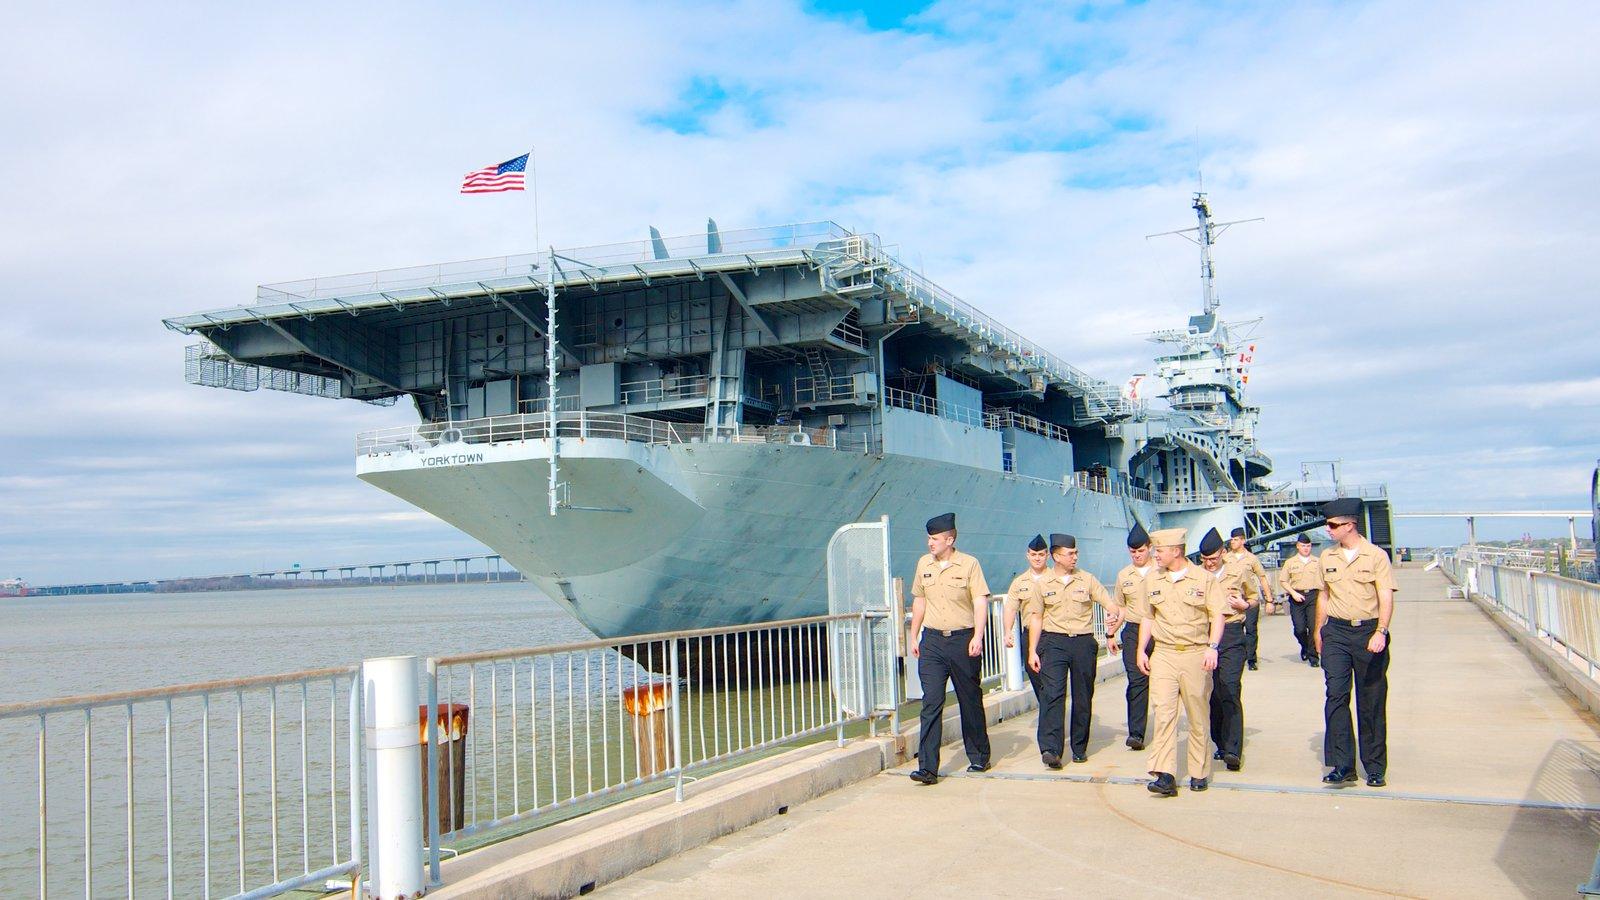 USS Yorktown caracterizando uma marina e itens militares